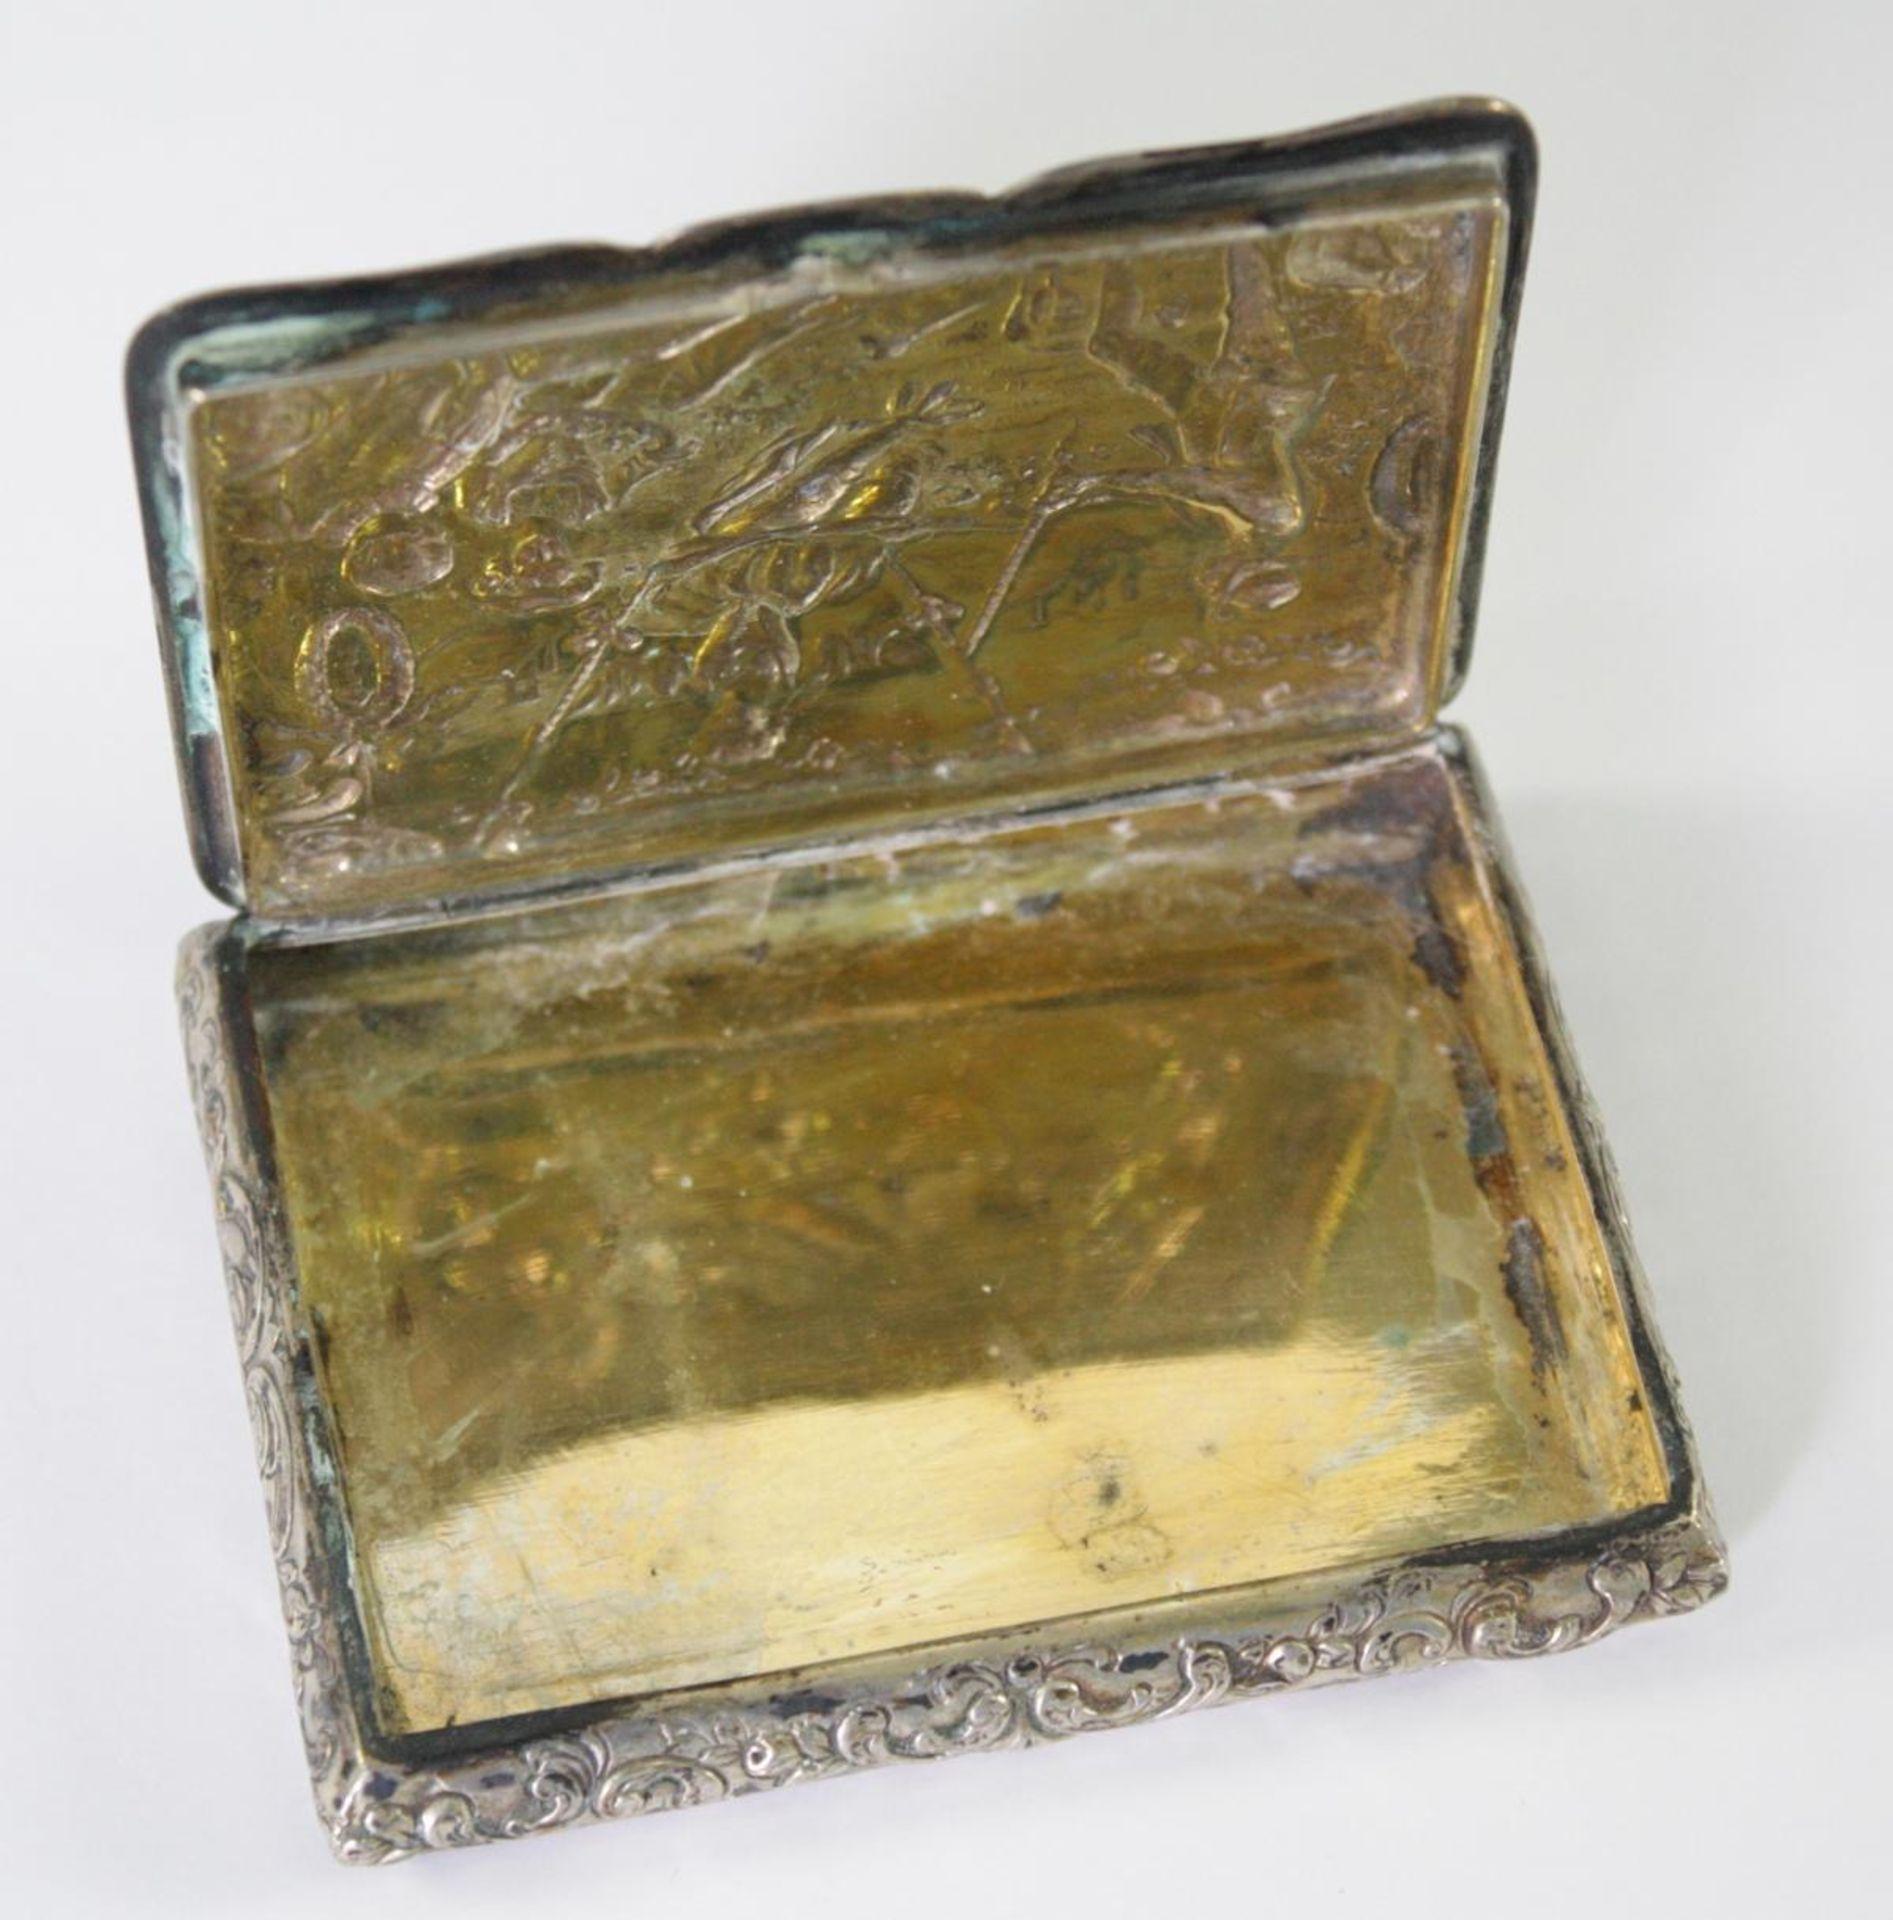 Silberne Deckeldose 800er Silber um 1900 - Bild 3 aus 4